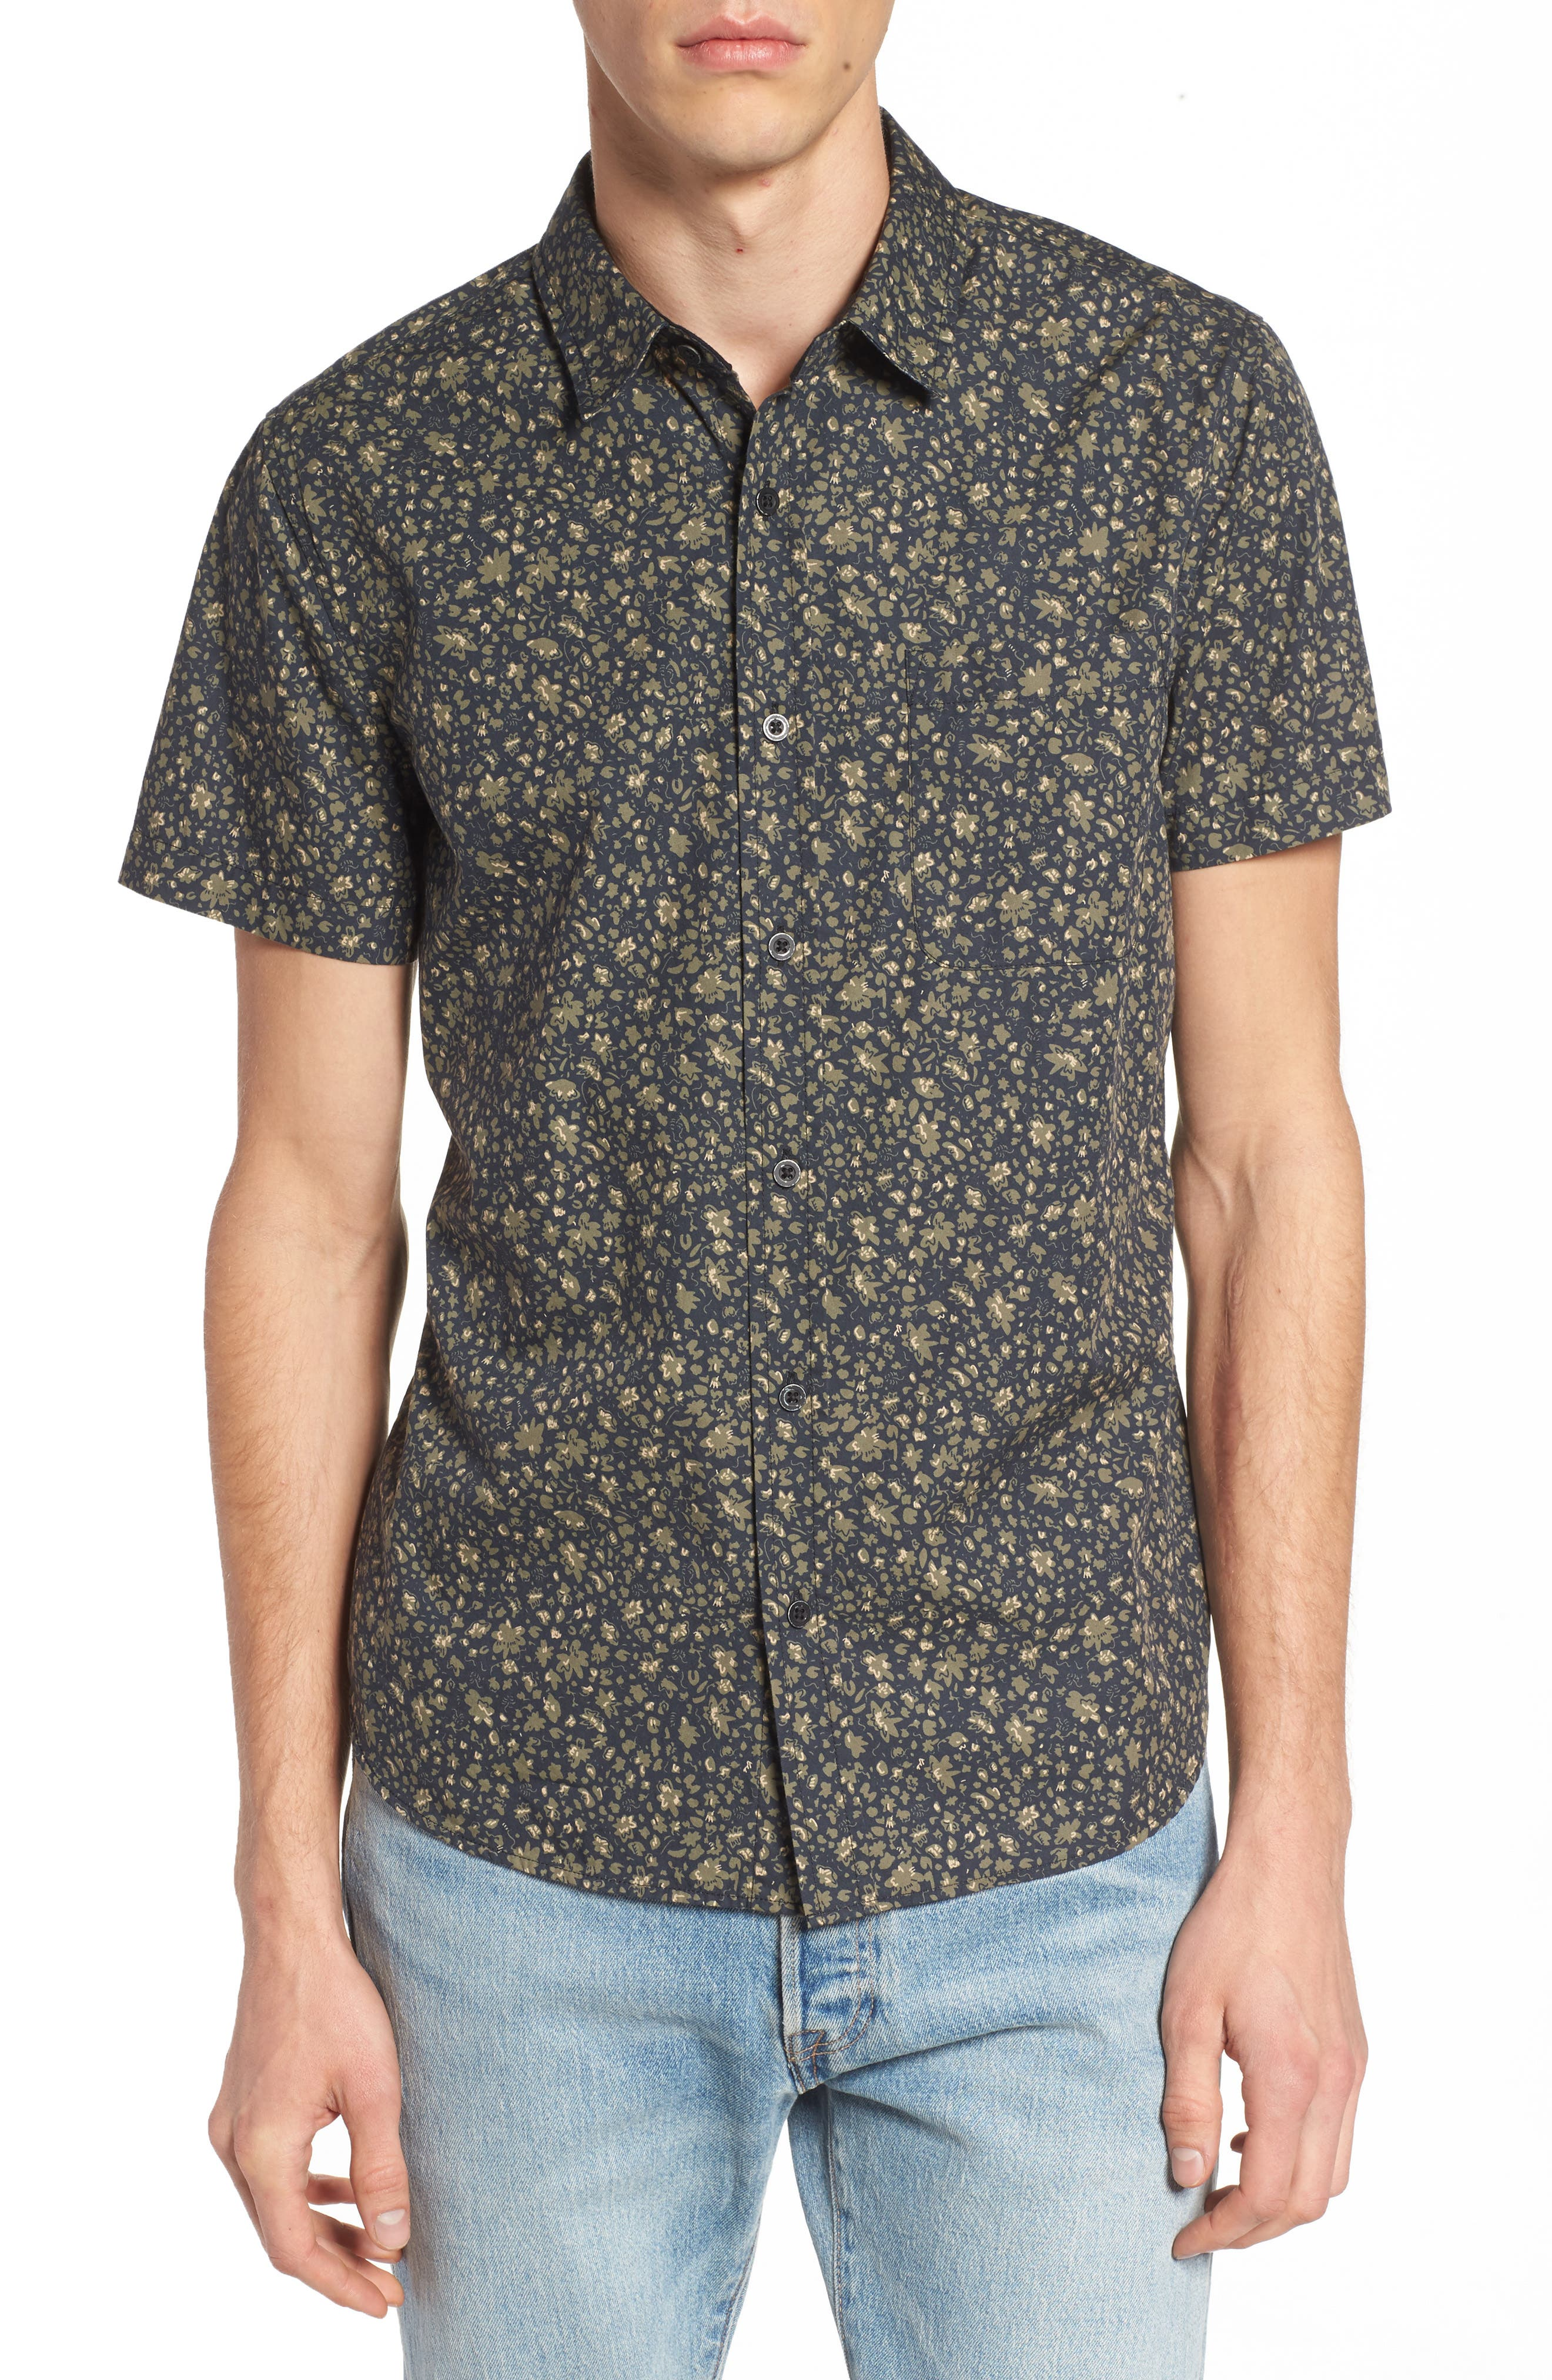 Nash Slim Fit Print Sport Shirt,                         Main,                         color, Floral Camo Black/ Ivy